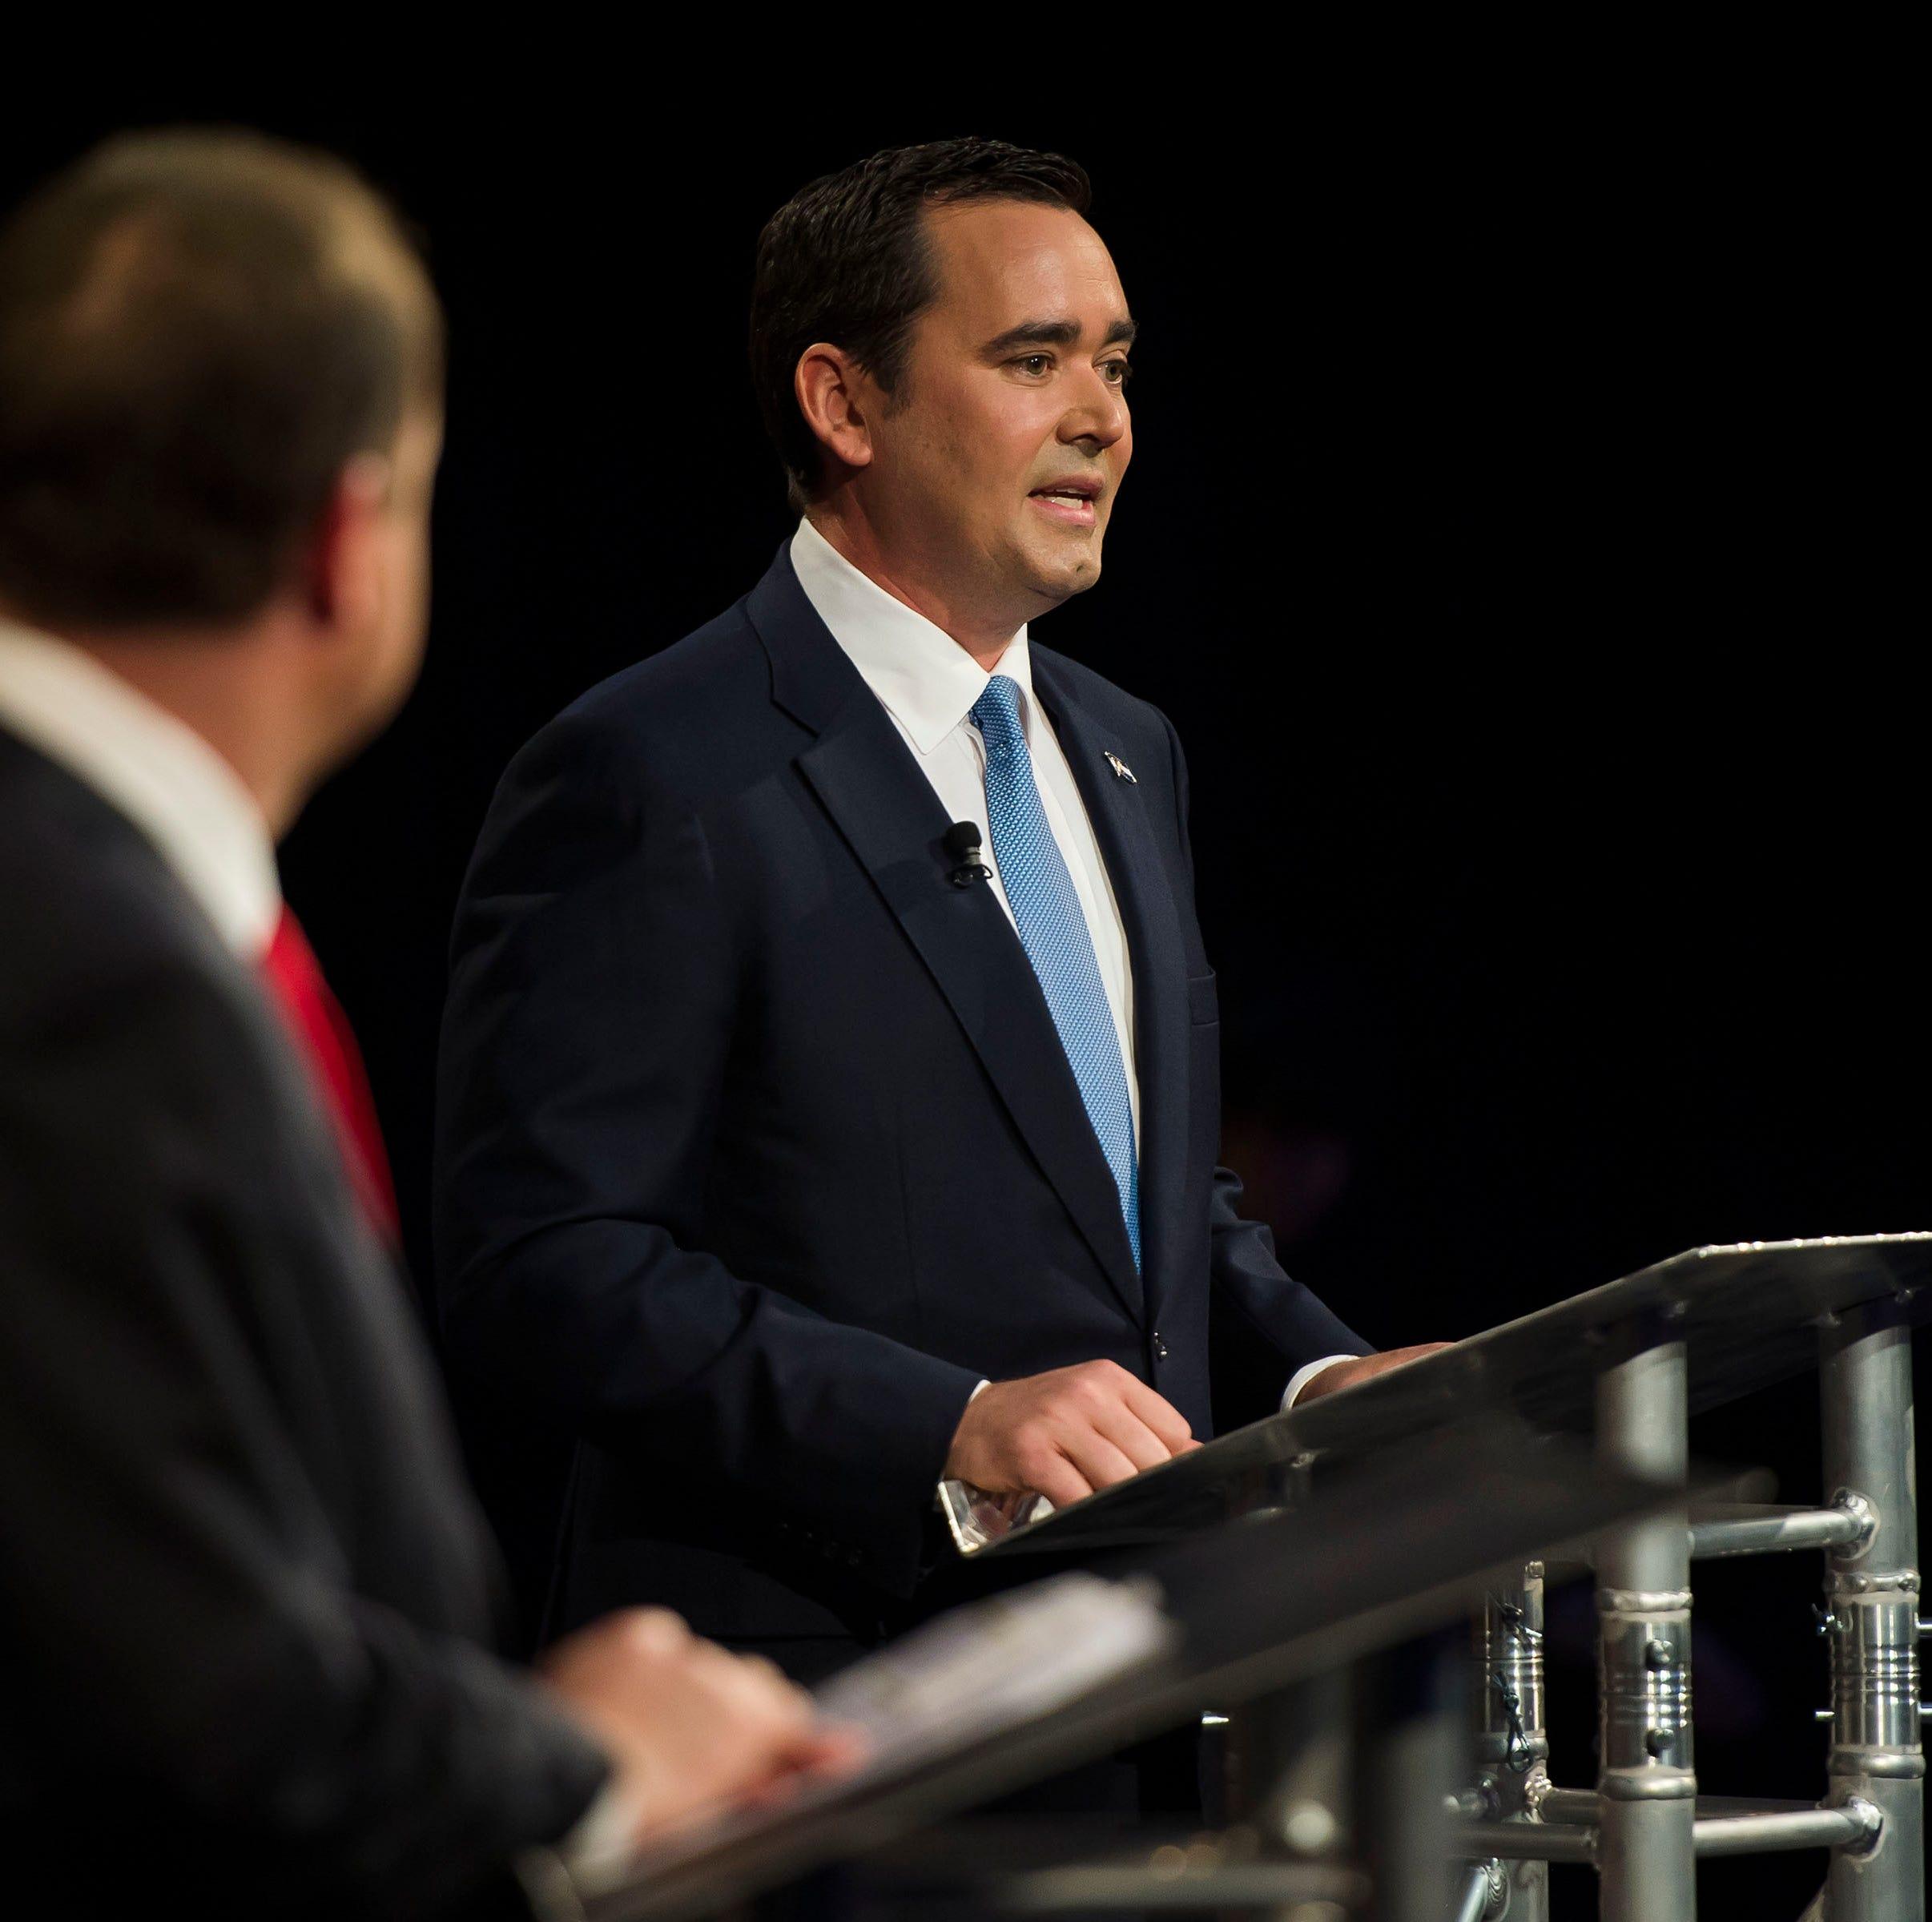 Colorado governor candidates Jared Polis, Walker Stapleton face off at debate